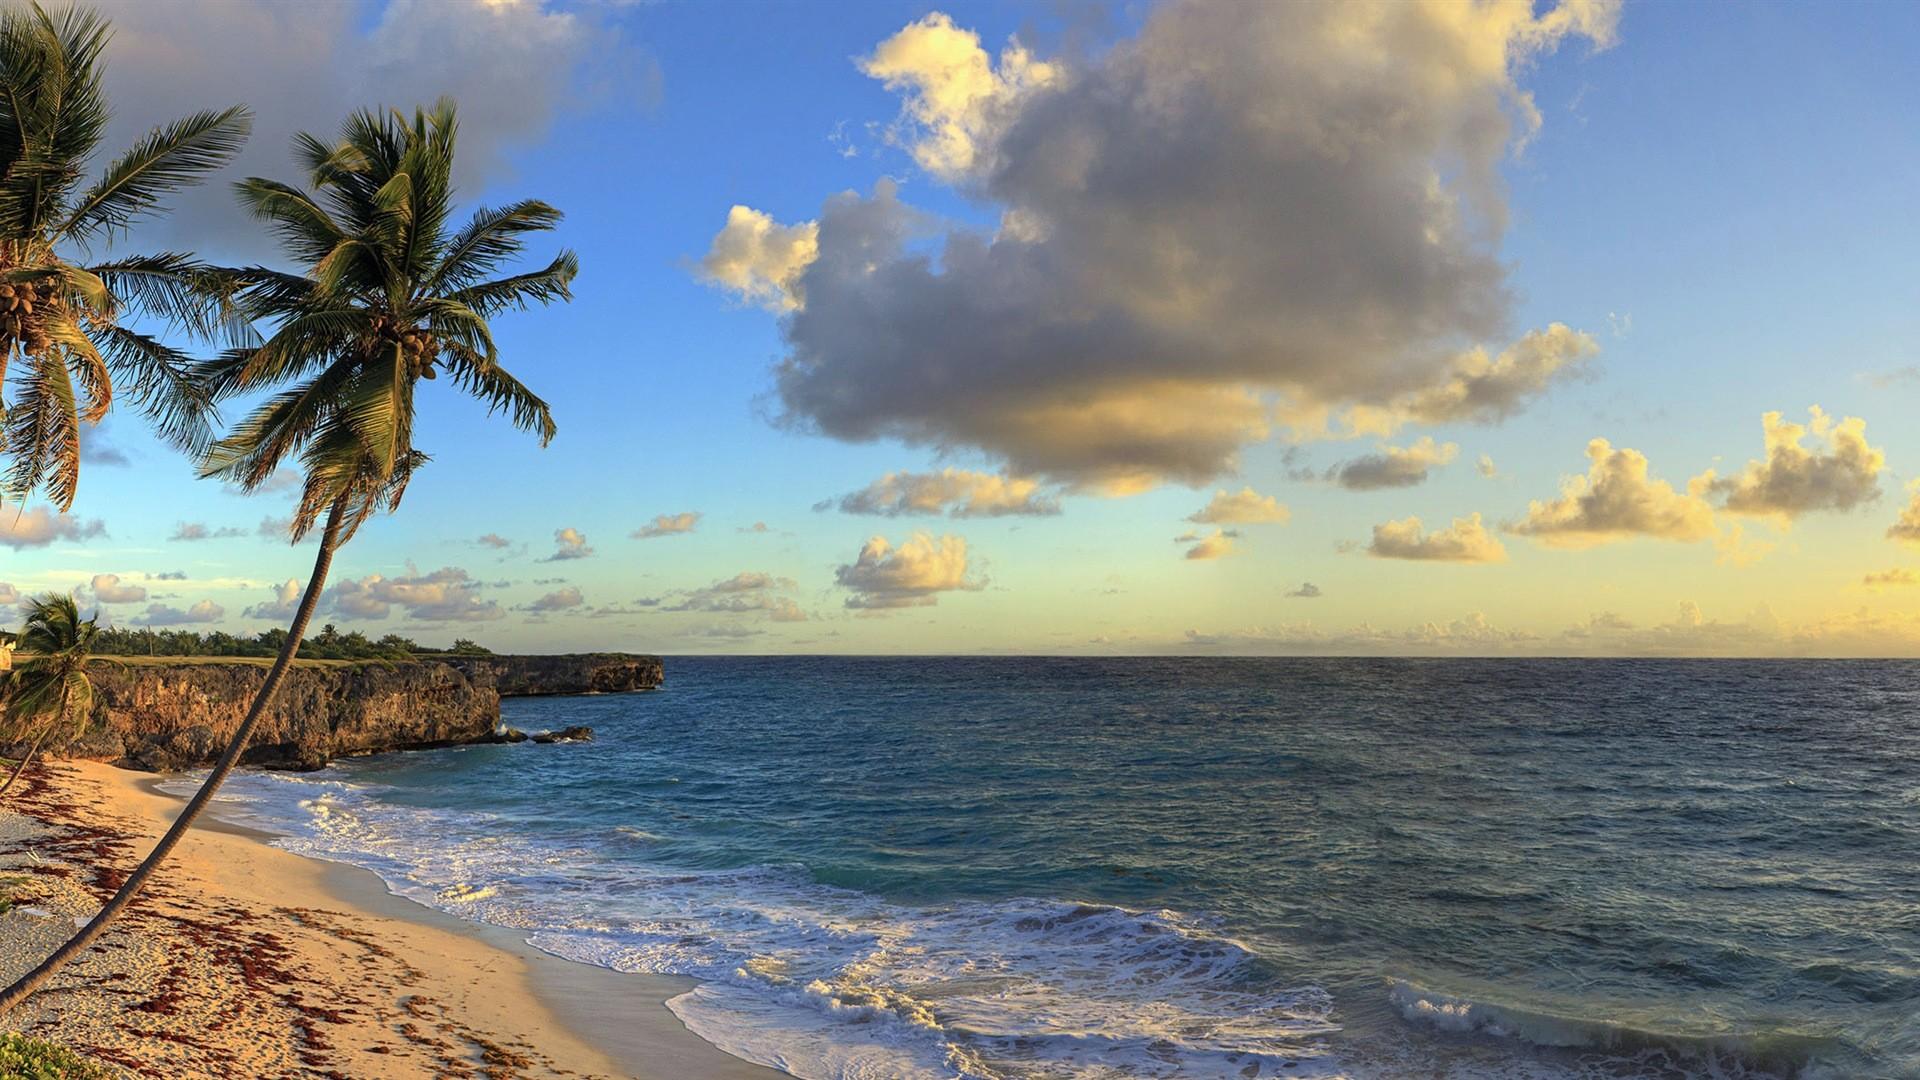 Beautiful beach sunset, Windows 8 panoramic widescreen wallpapers #6 –  1920×1080.